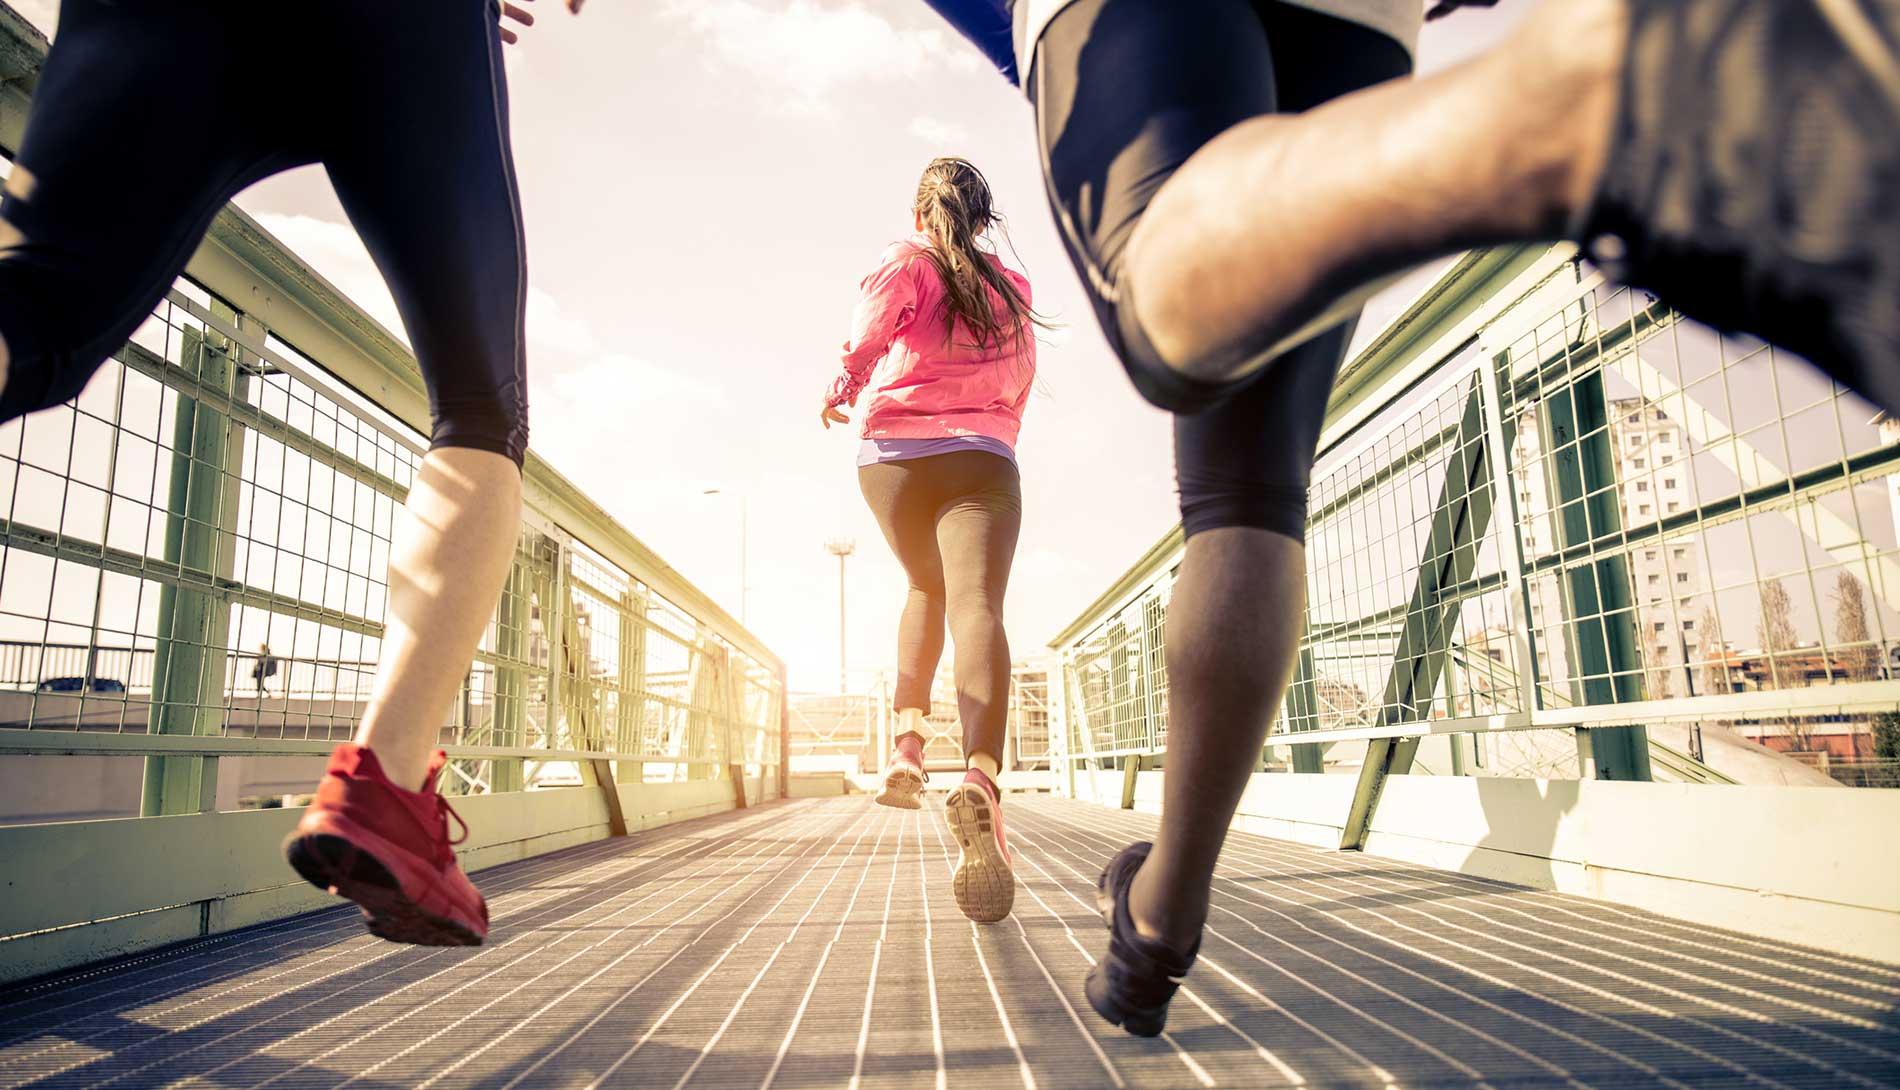 Runners across bridge